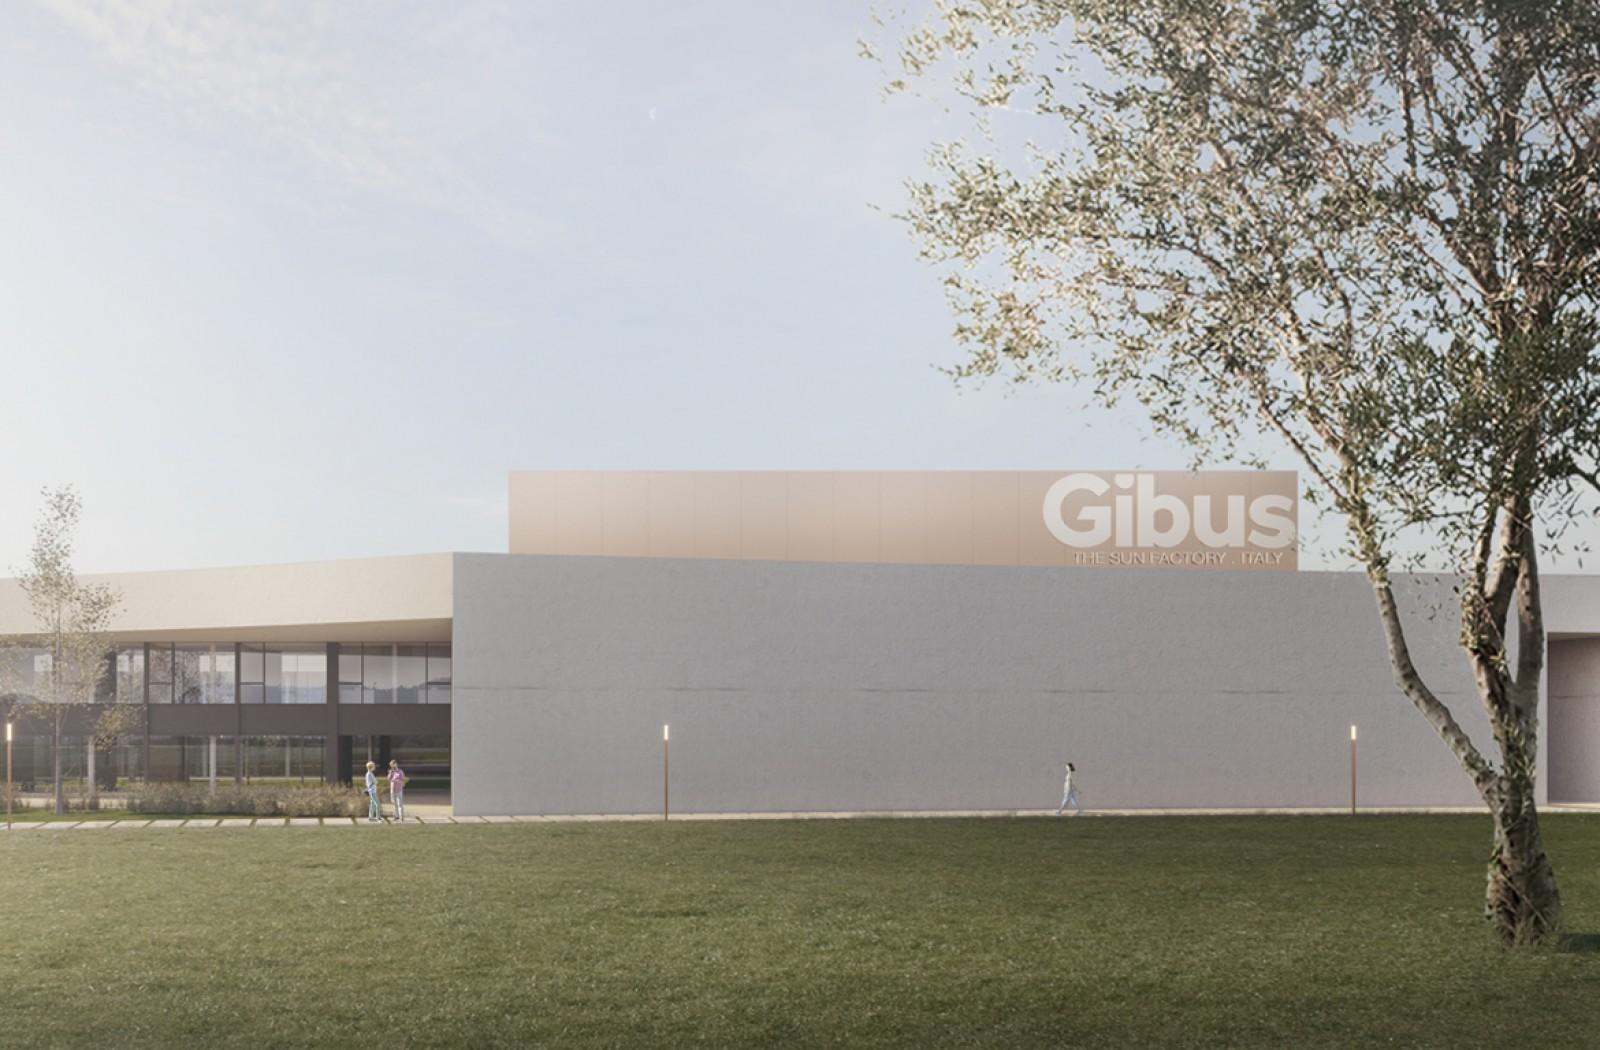 Gibus the sun factory